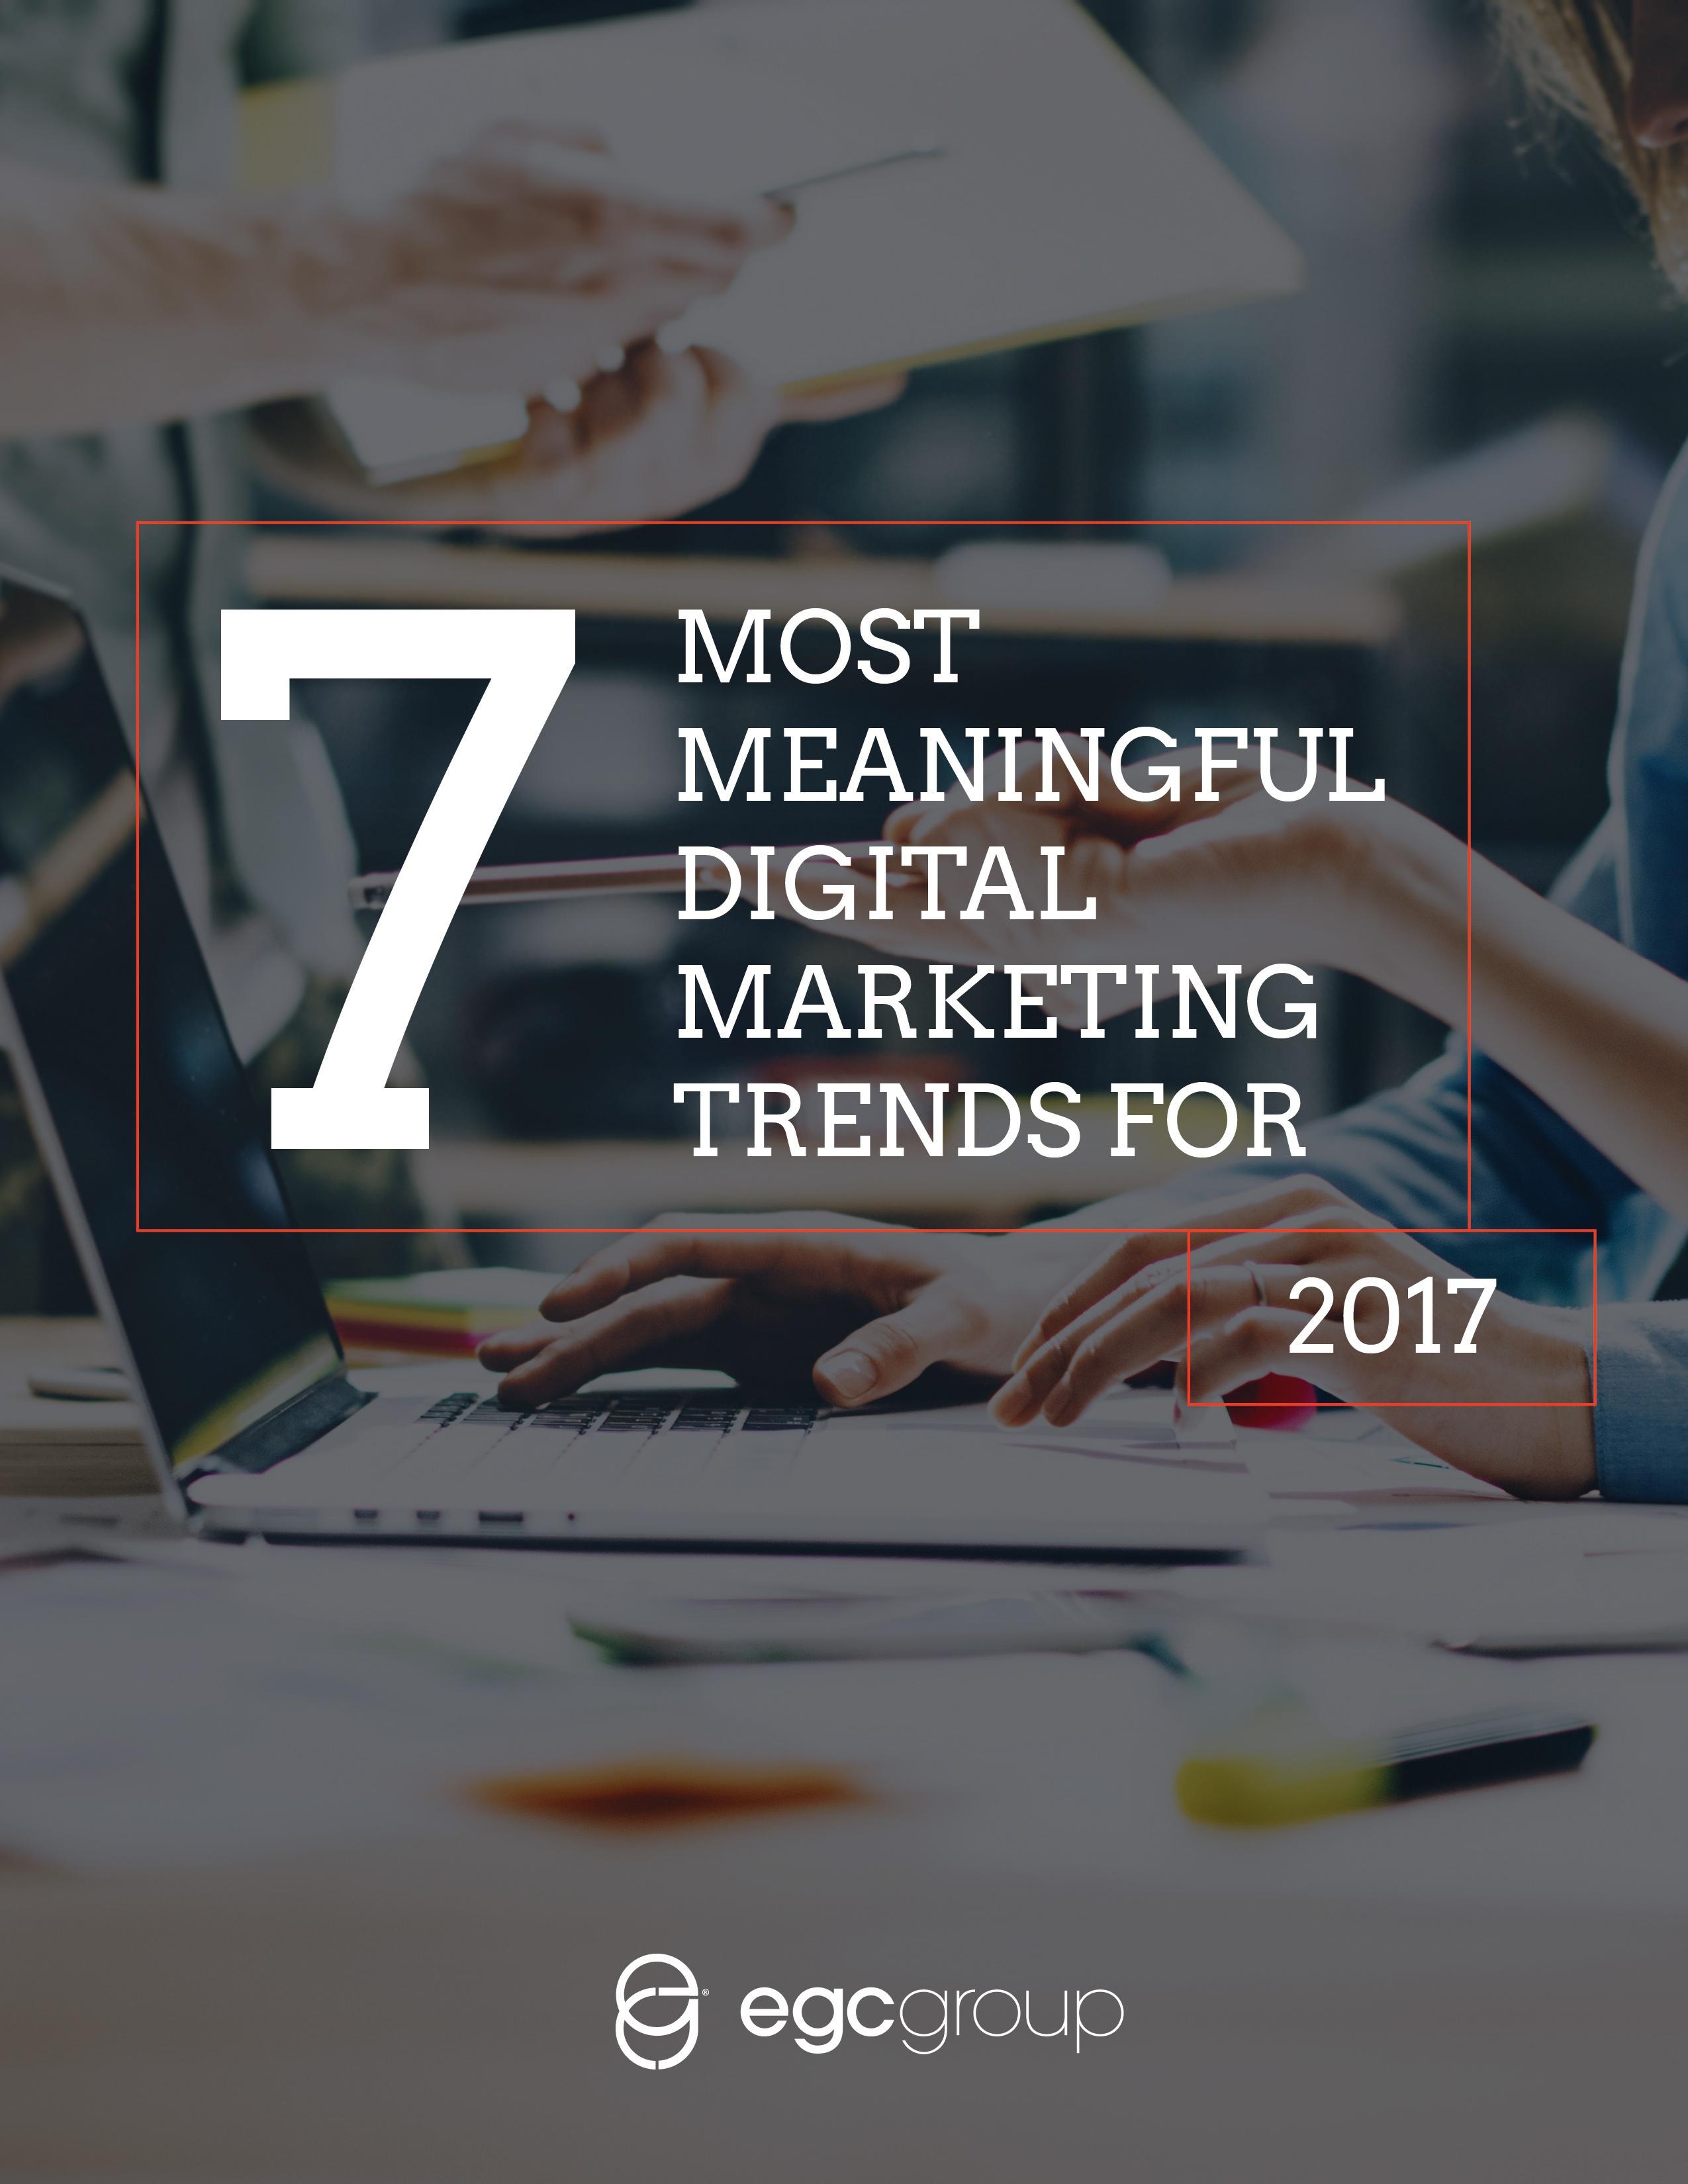 MarketingTrends_ebook guide